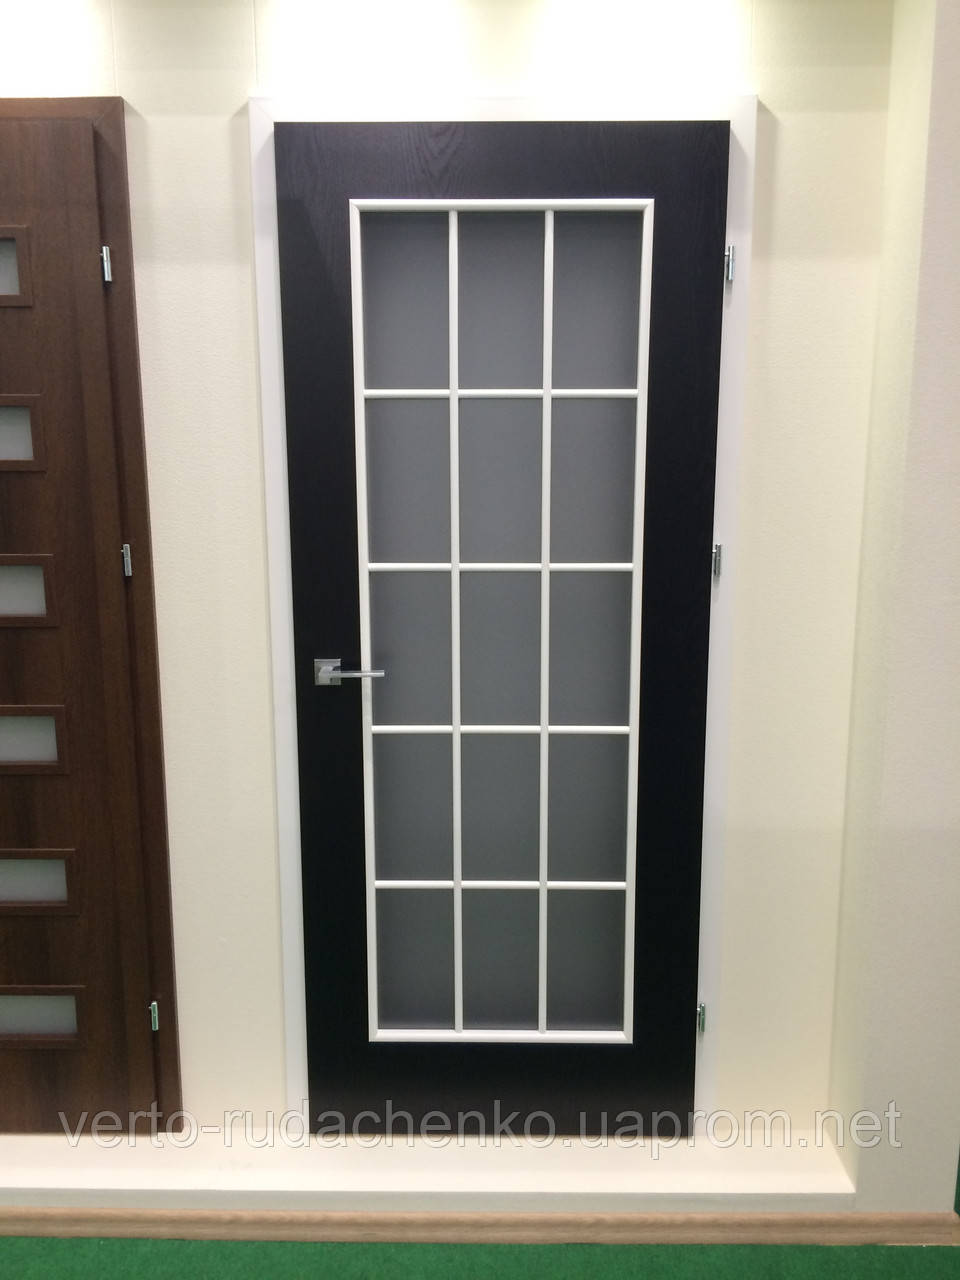 Двери Verto Стандарт 2Б цвет Венге «Симплекс»